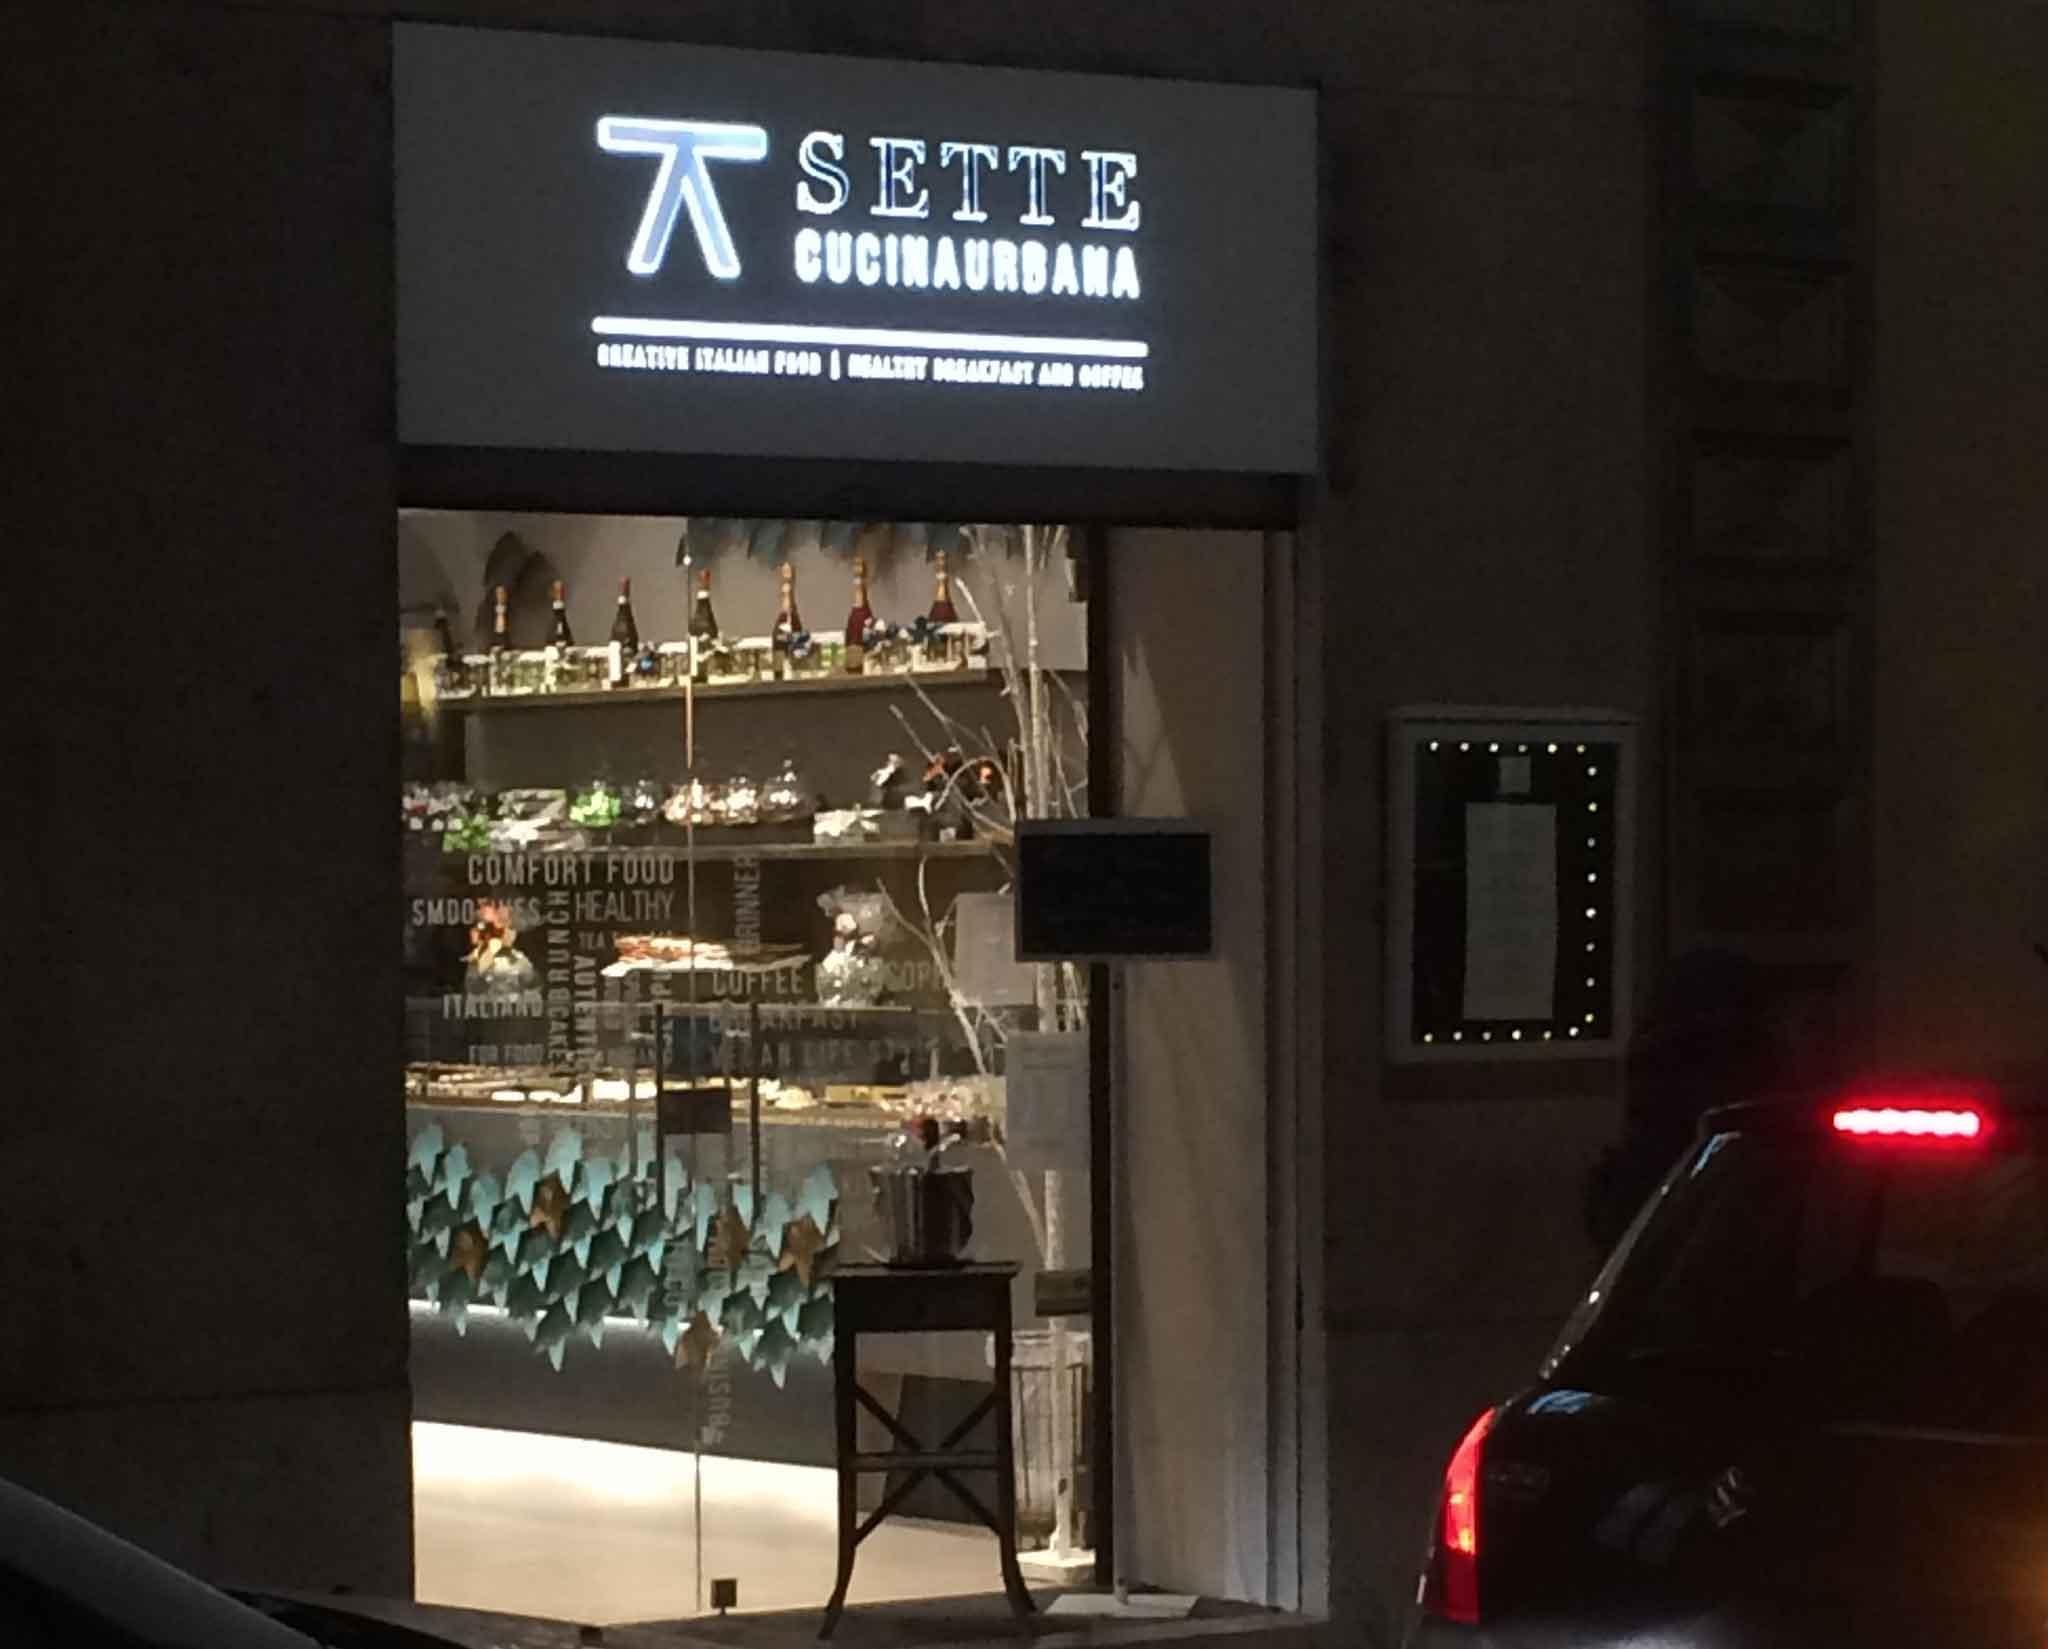 sette-cucinaurbana-milano